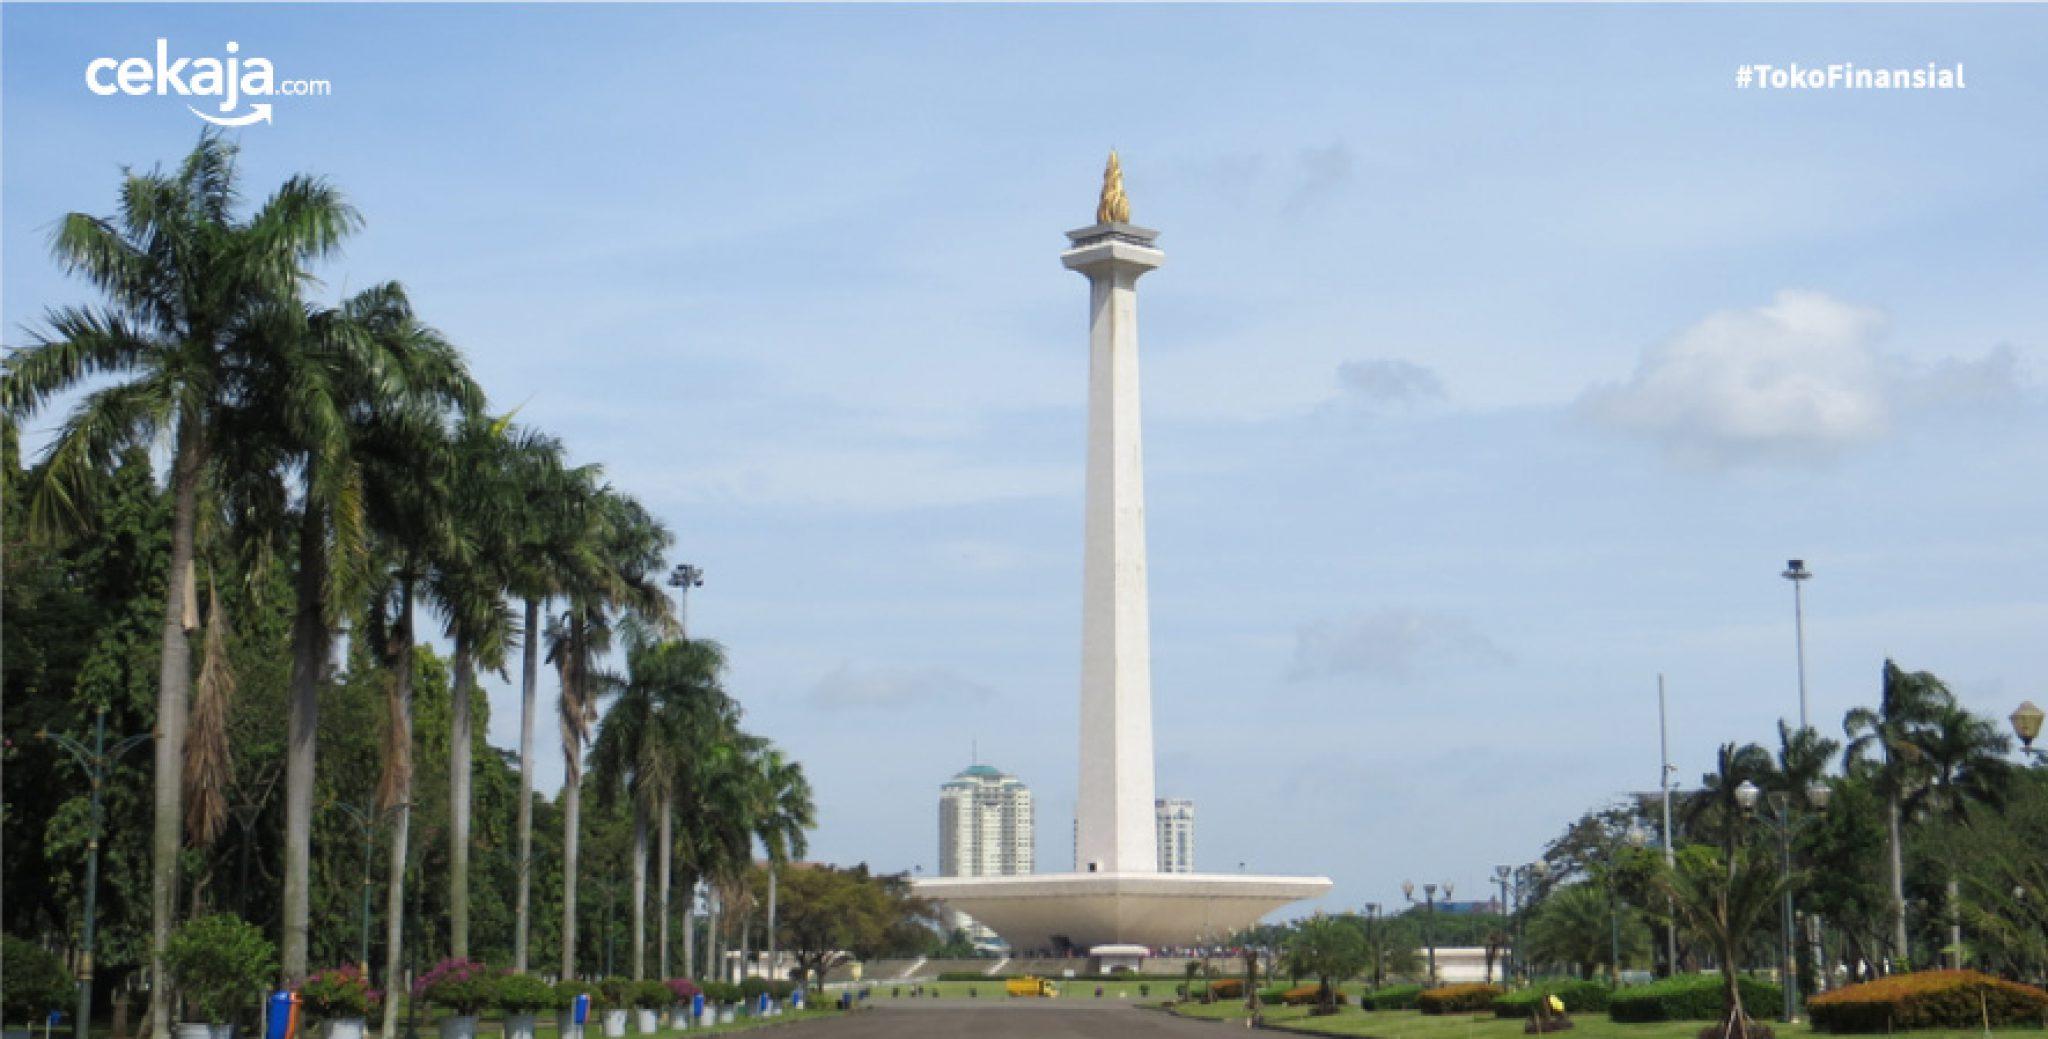 mudik Jakarta _ asuransi perjalanan - CekAja.com